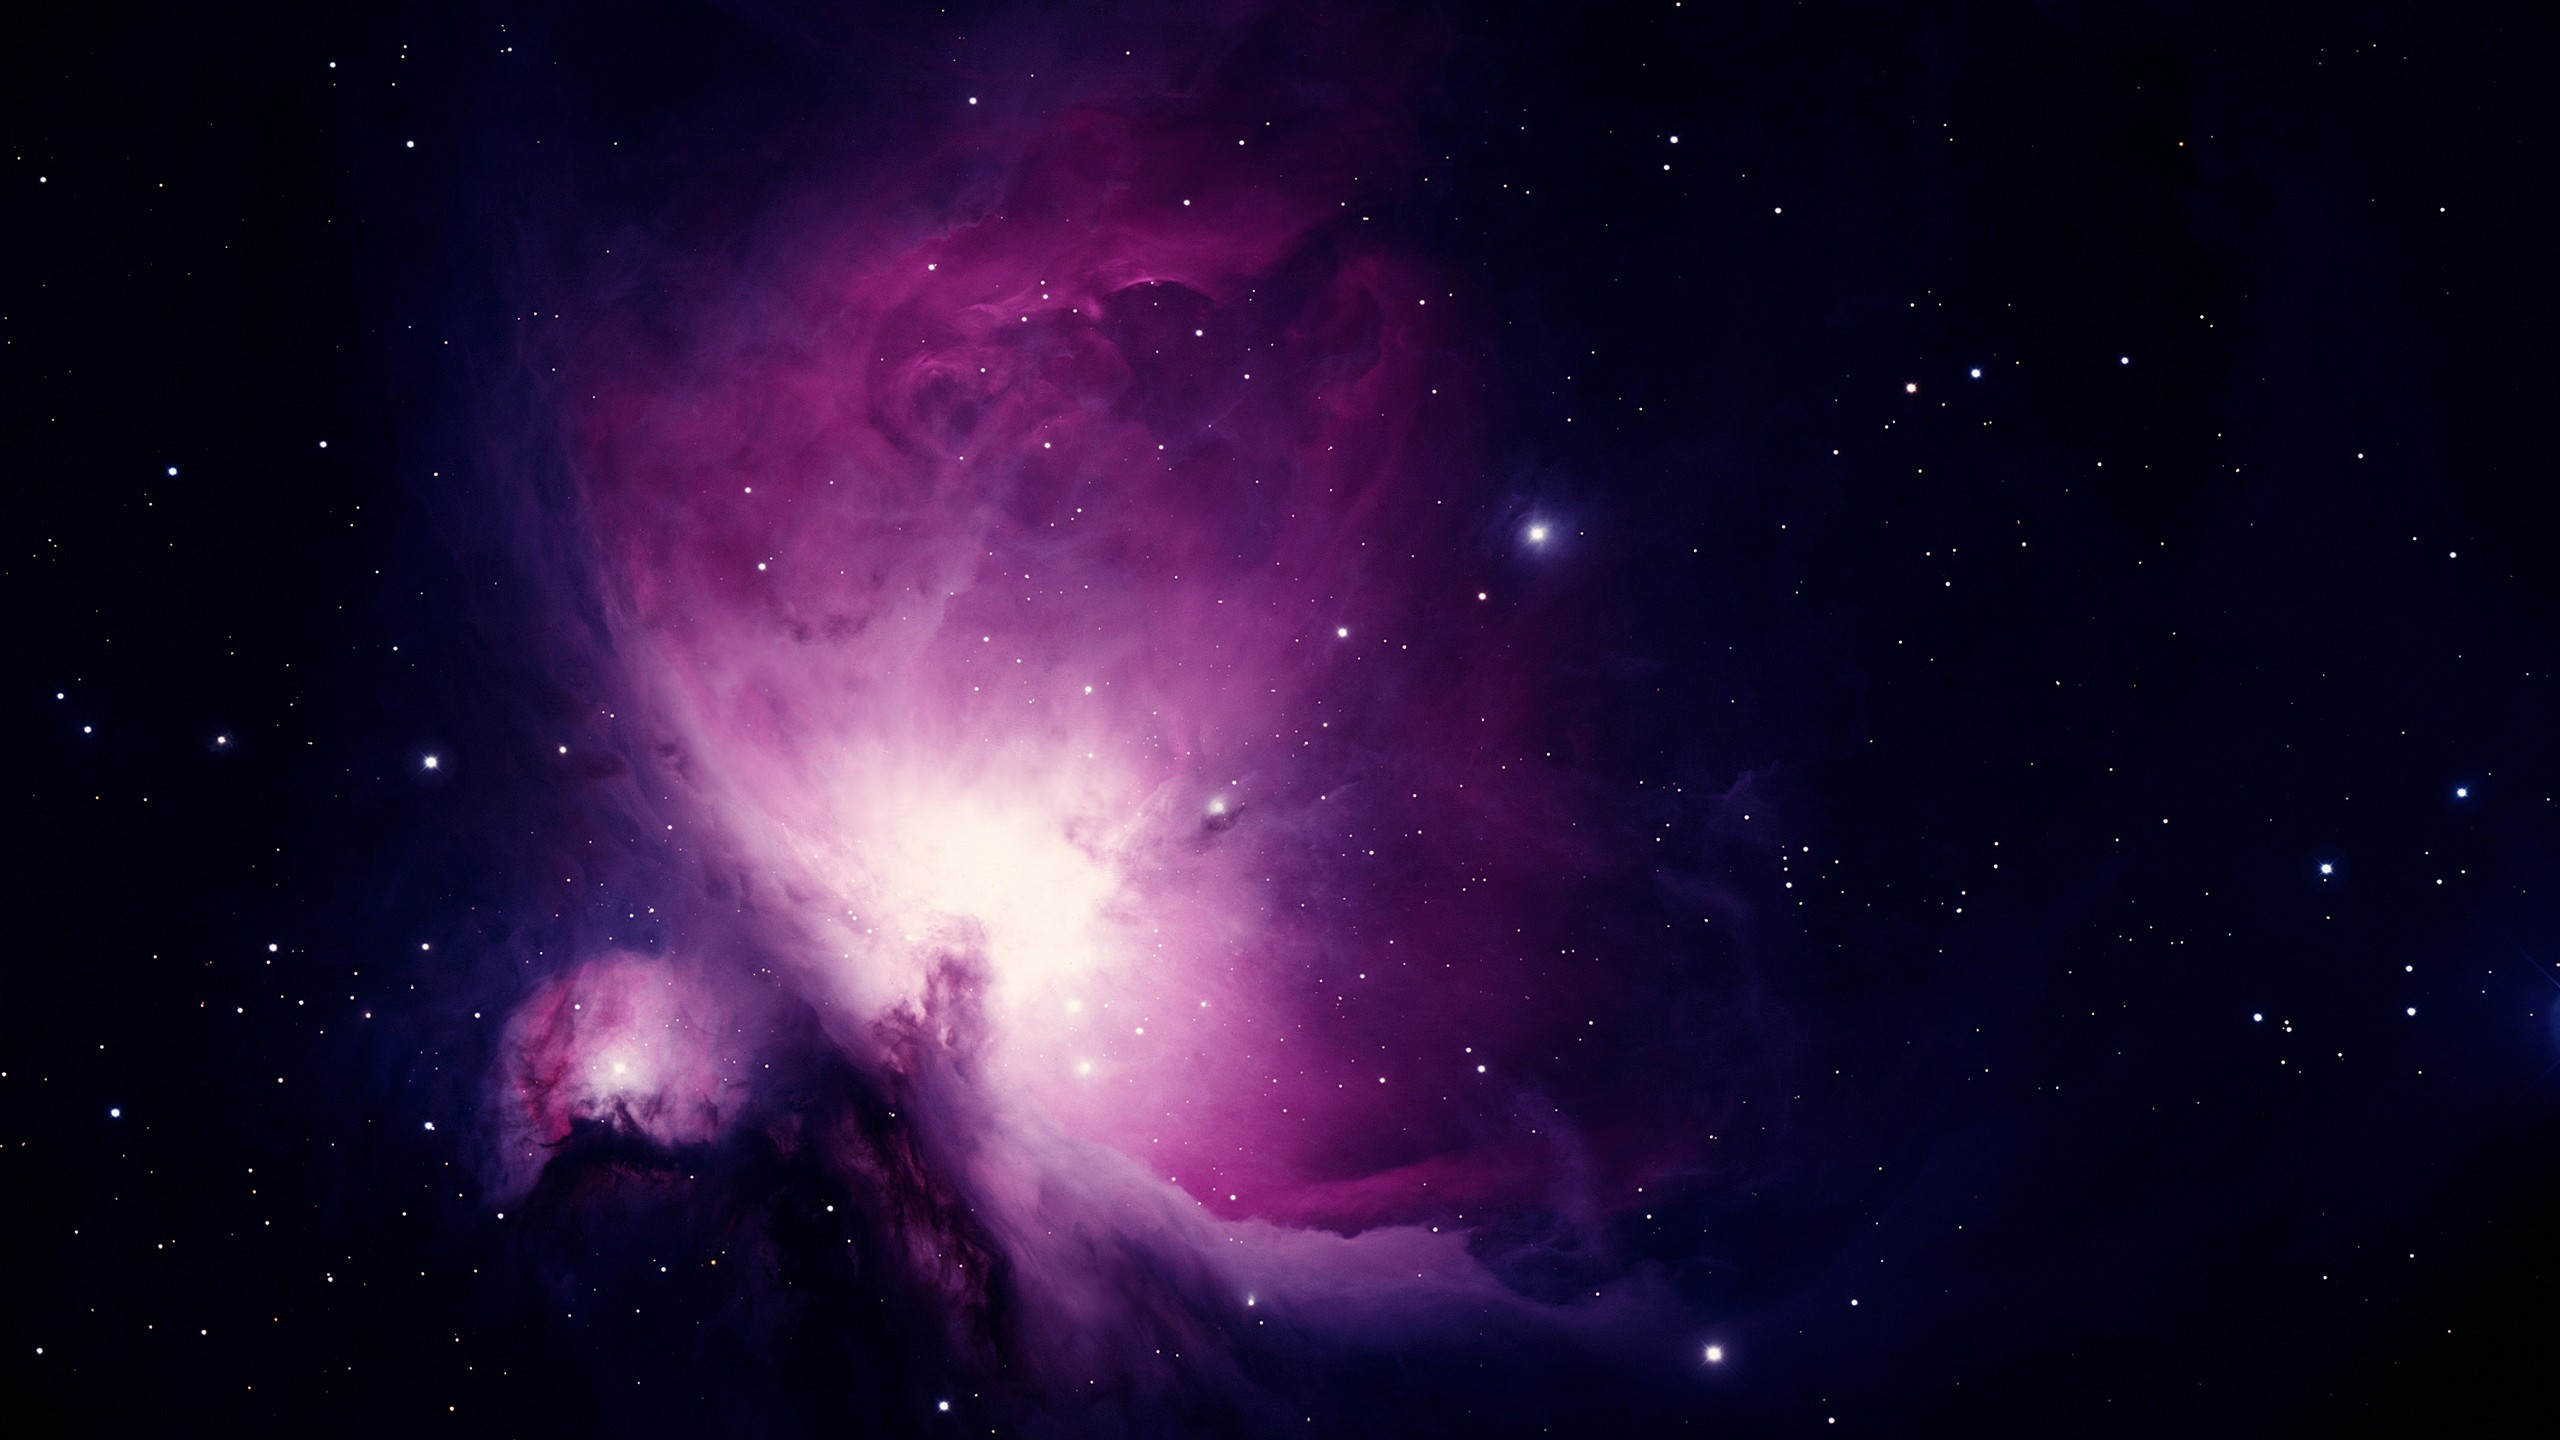 General 2560x1440 space nebula stars